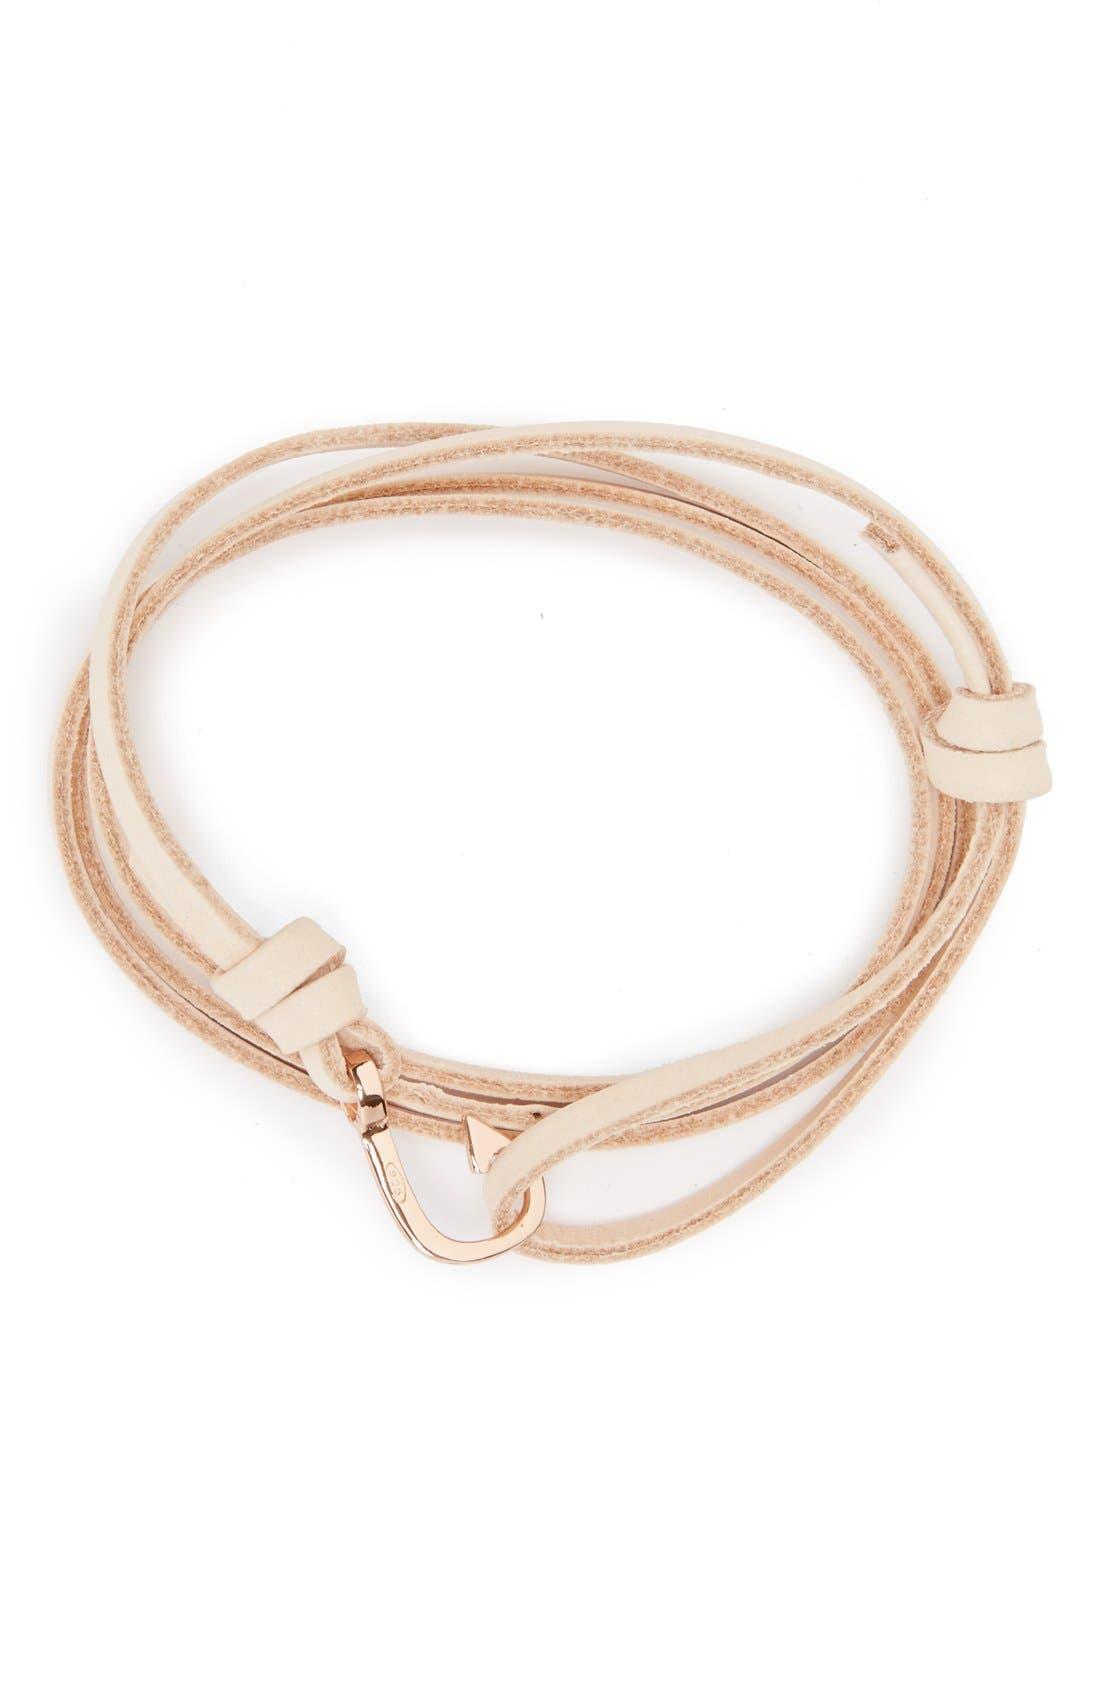 Rose Gold Mini Hook Leather Bracelet,                             Main thumbnail 1, color,                             Natural